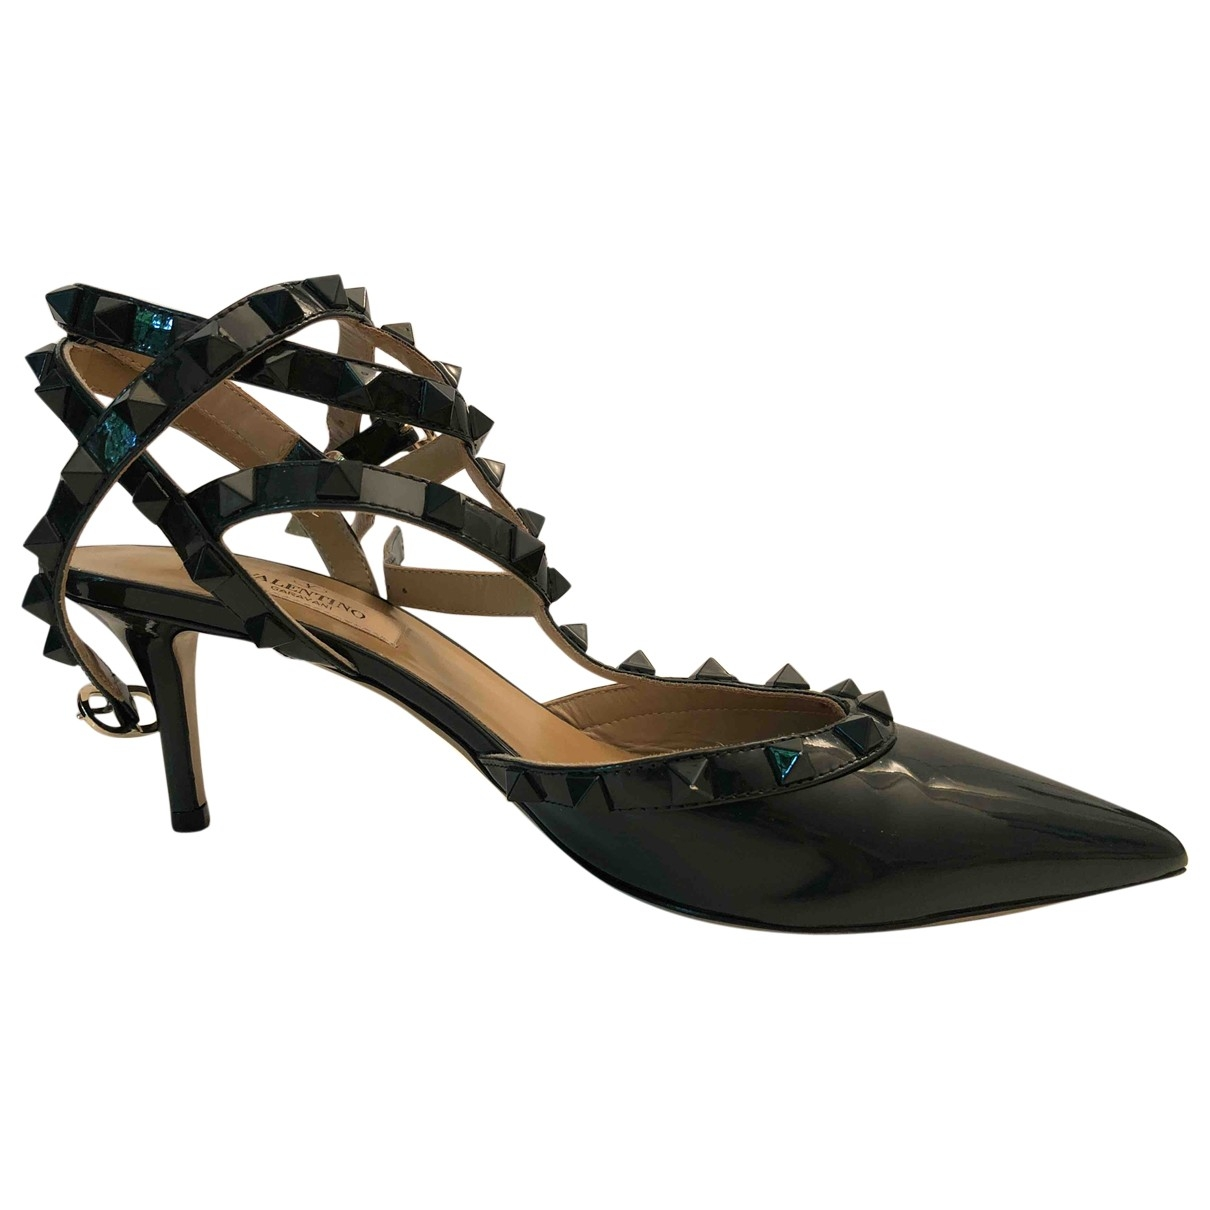 Valentino Garavani Rockstud Green Patent leather Heels for Women 37.5 EU